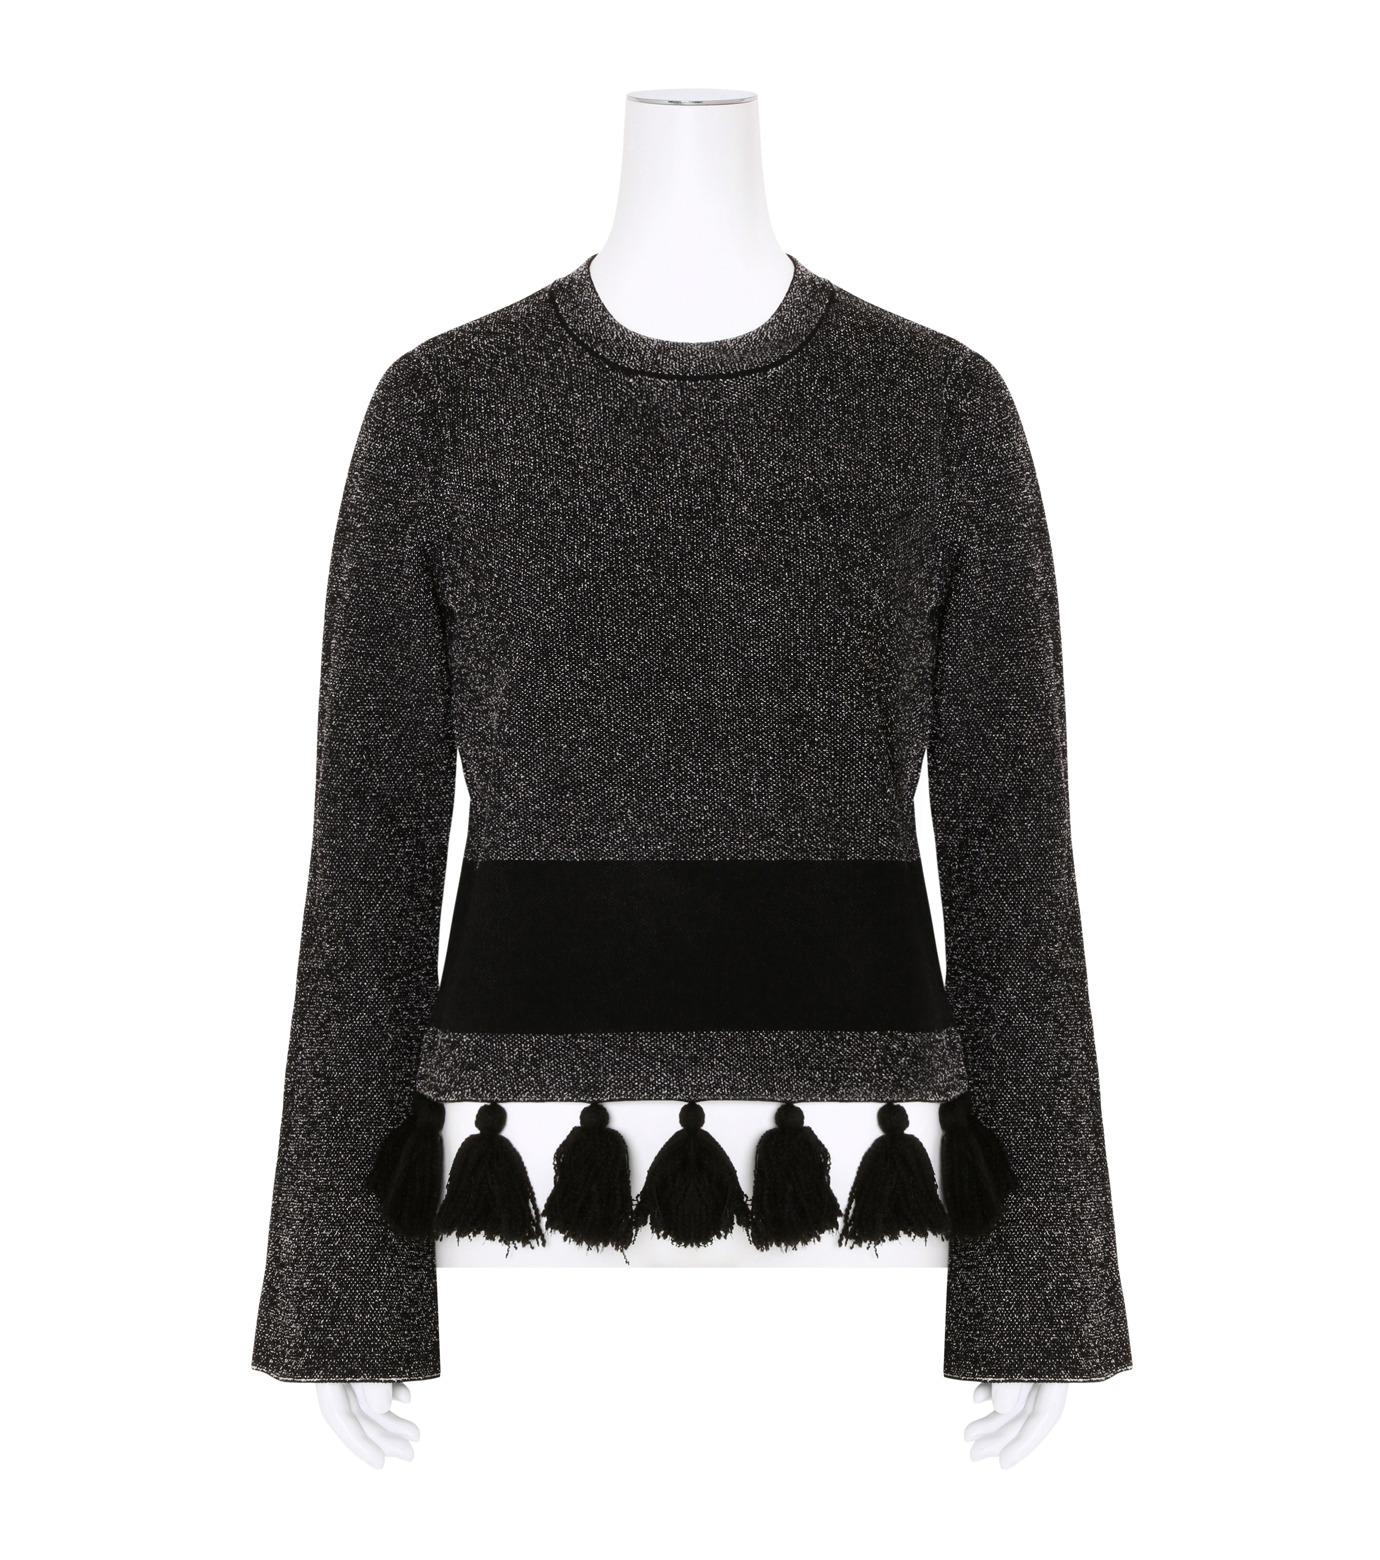 Proenza Schouler(プロエンザ スクーラー)のTweed Knit Flared Slv Crewneck-BLACK(ニット/knit)-R163707-13 拡大詳細画像1